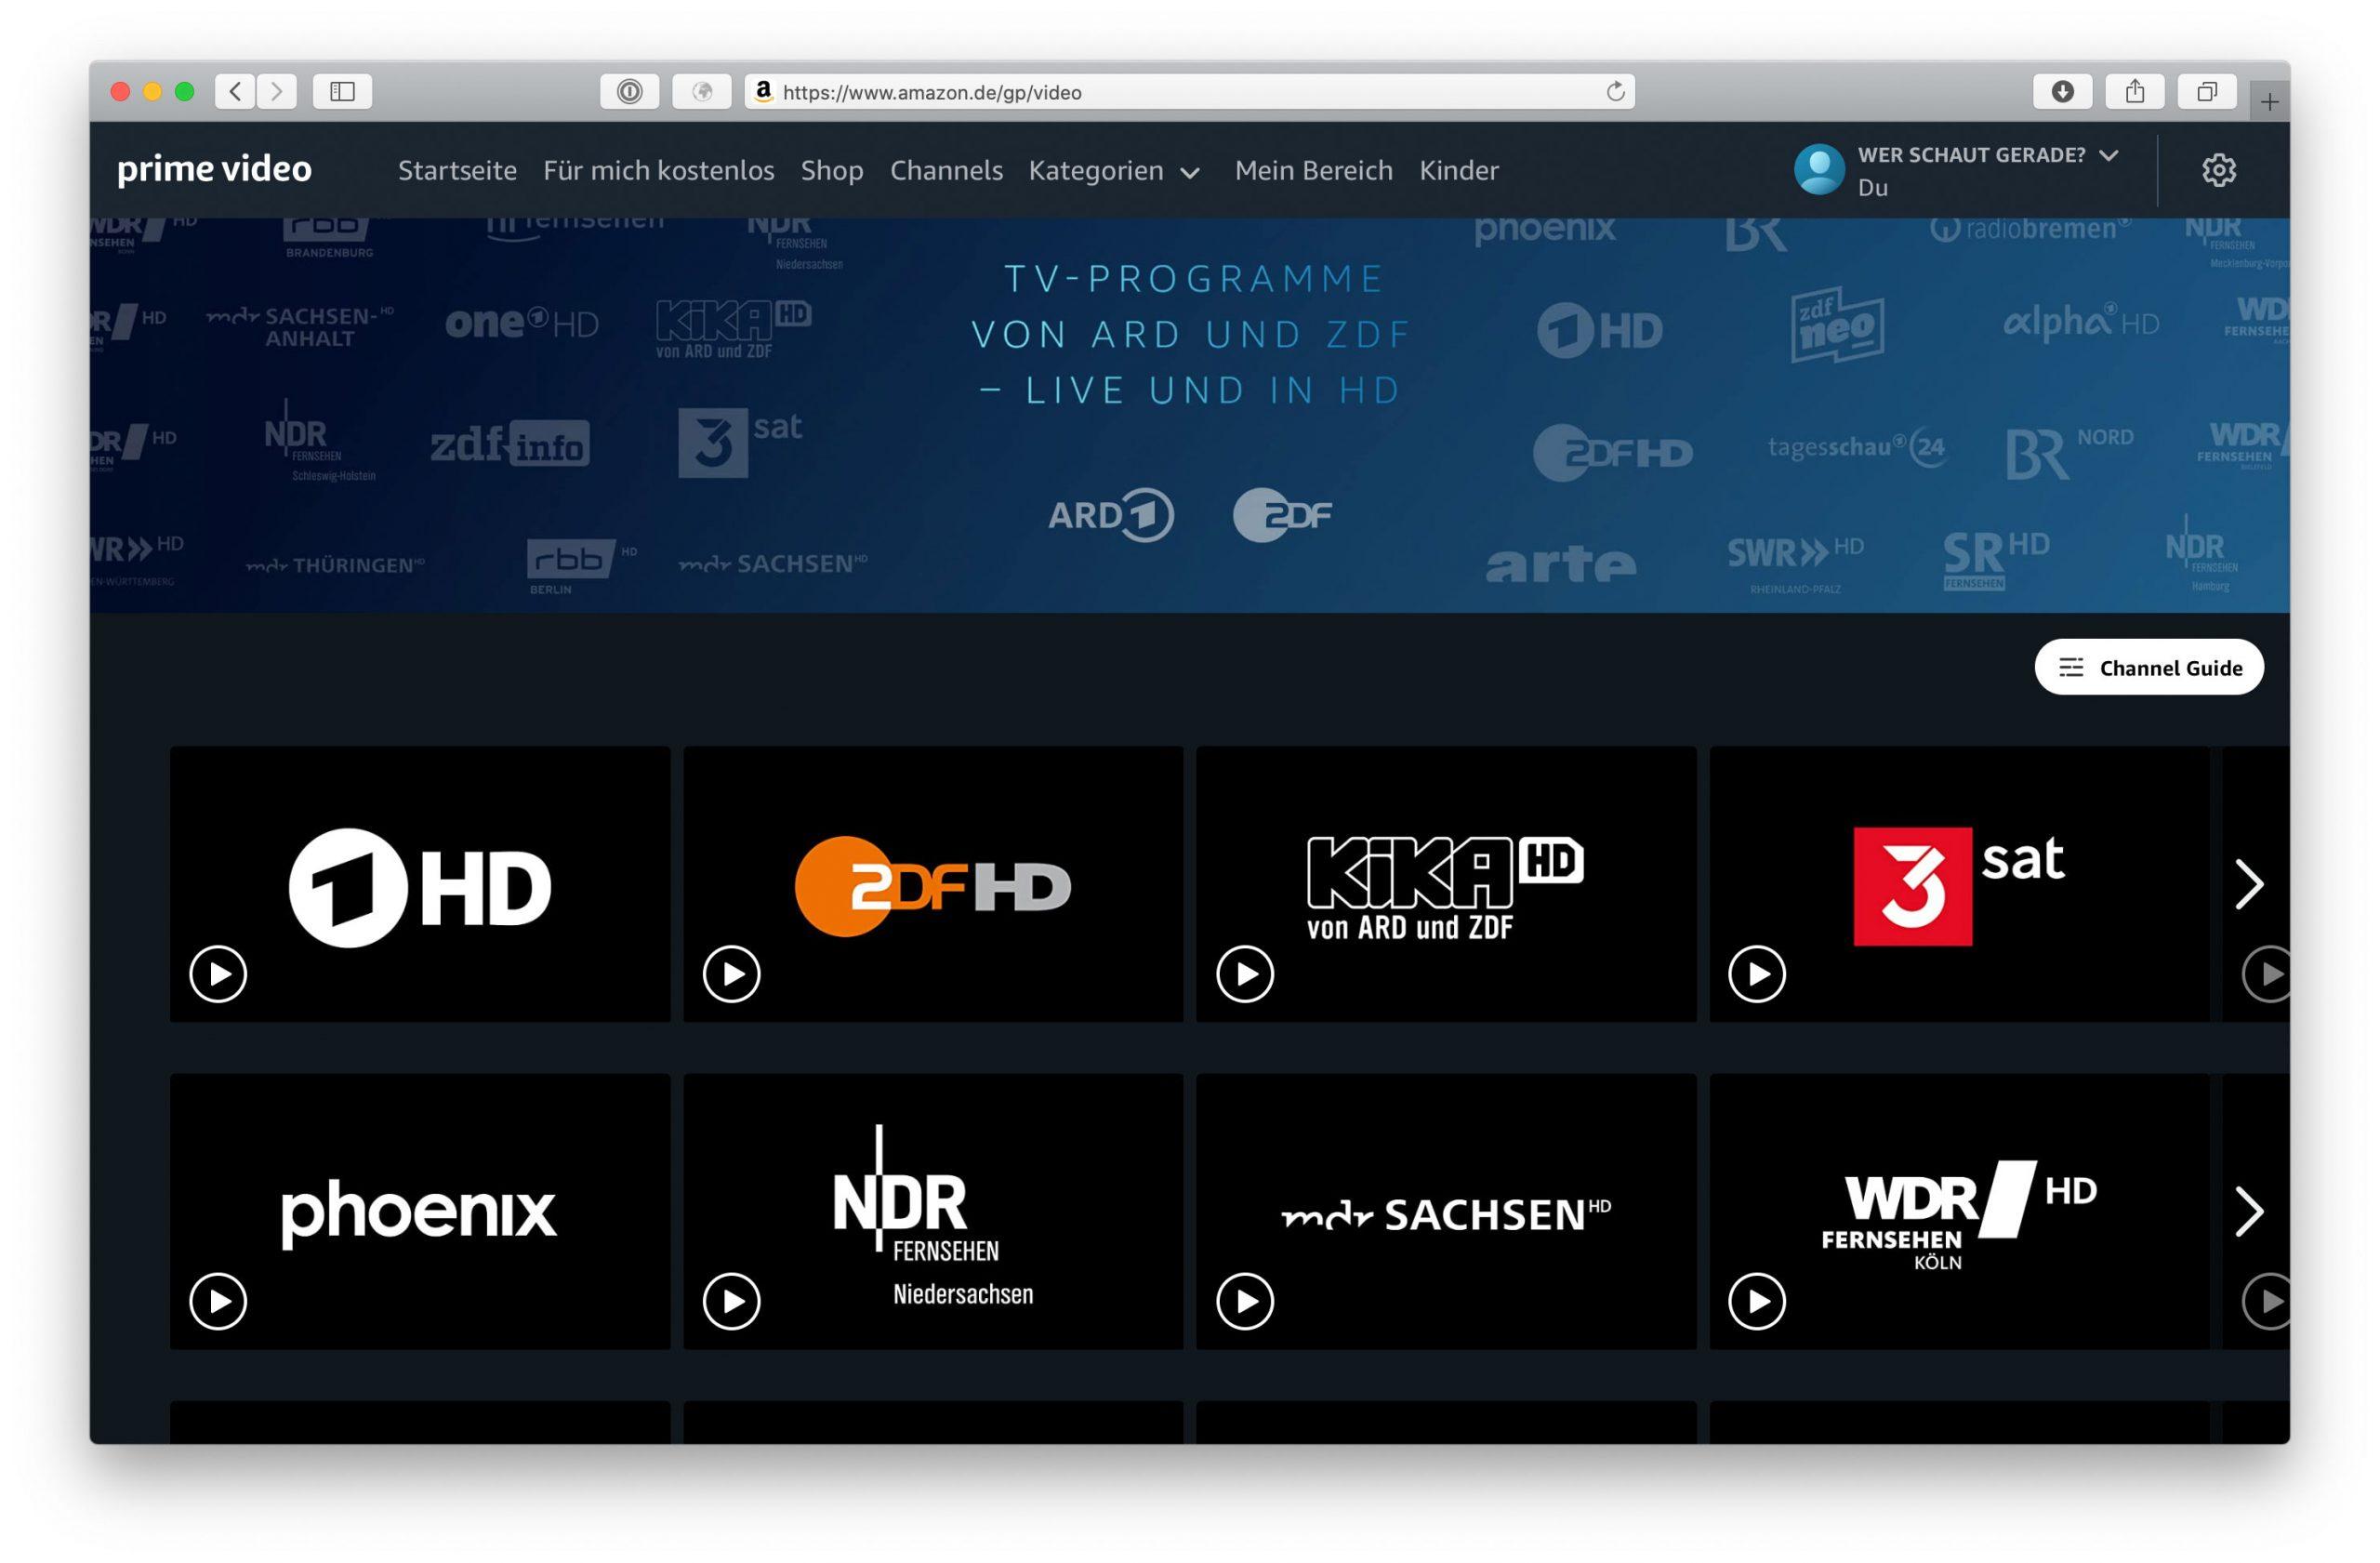 Prime Video Tv-Sendungen